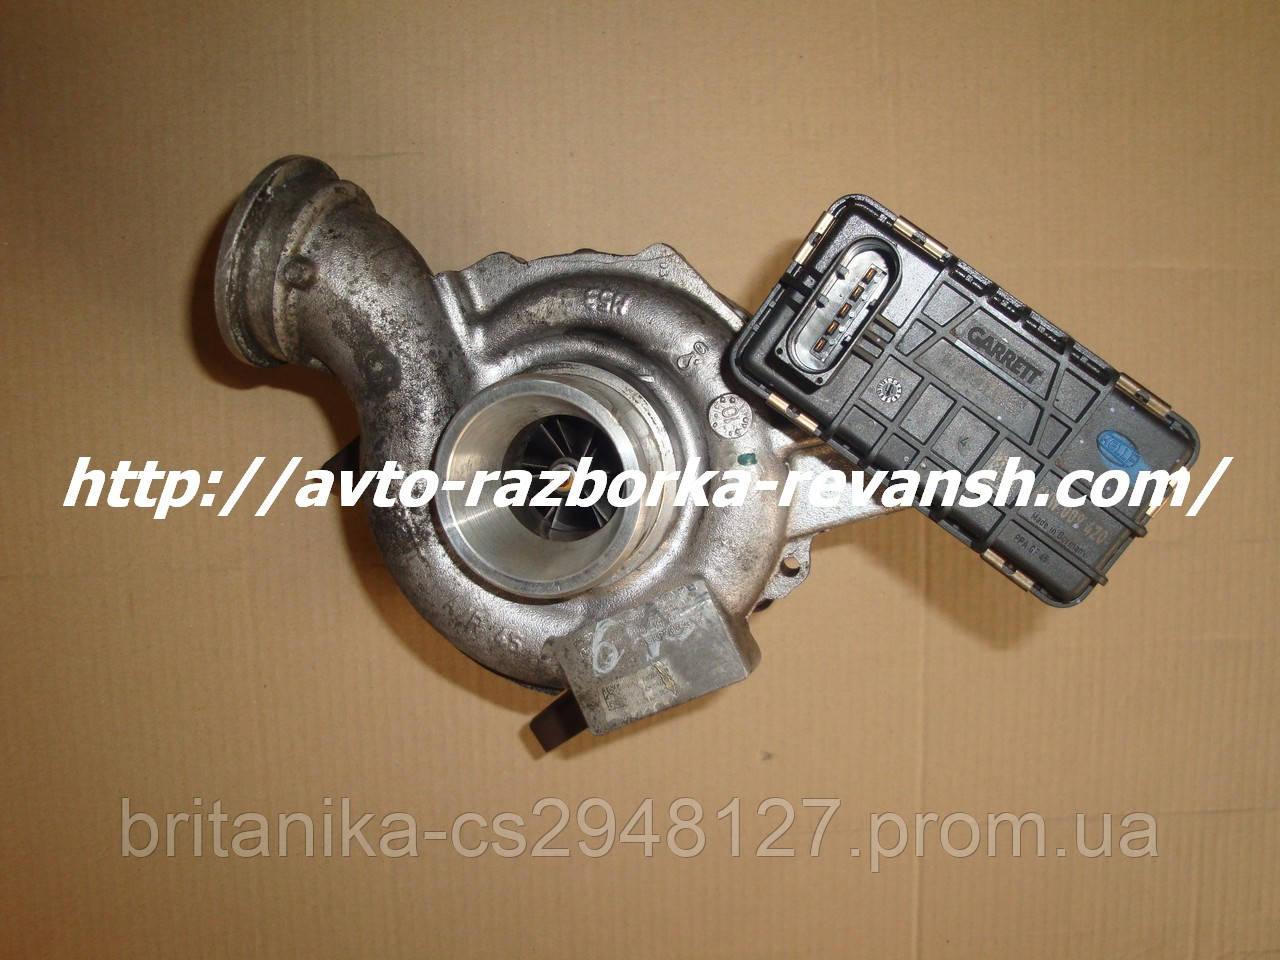 Турбина Мерседес Спринтер 906 (ОМ646  2.2 ) електронная